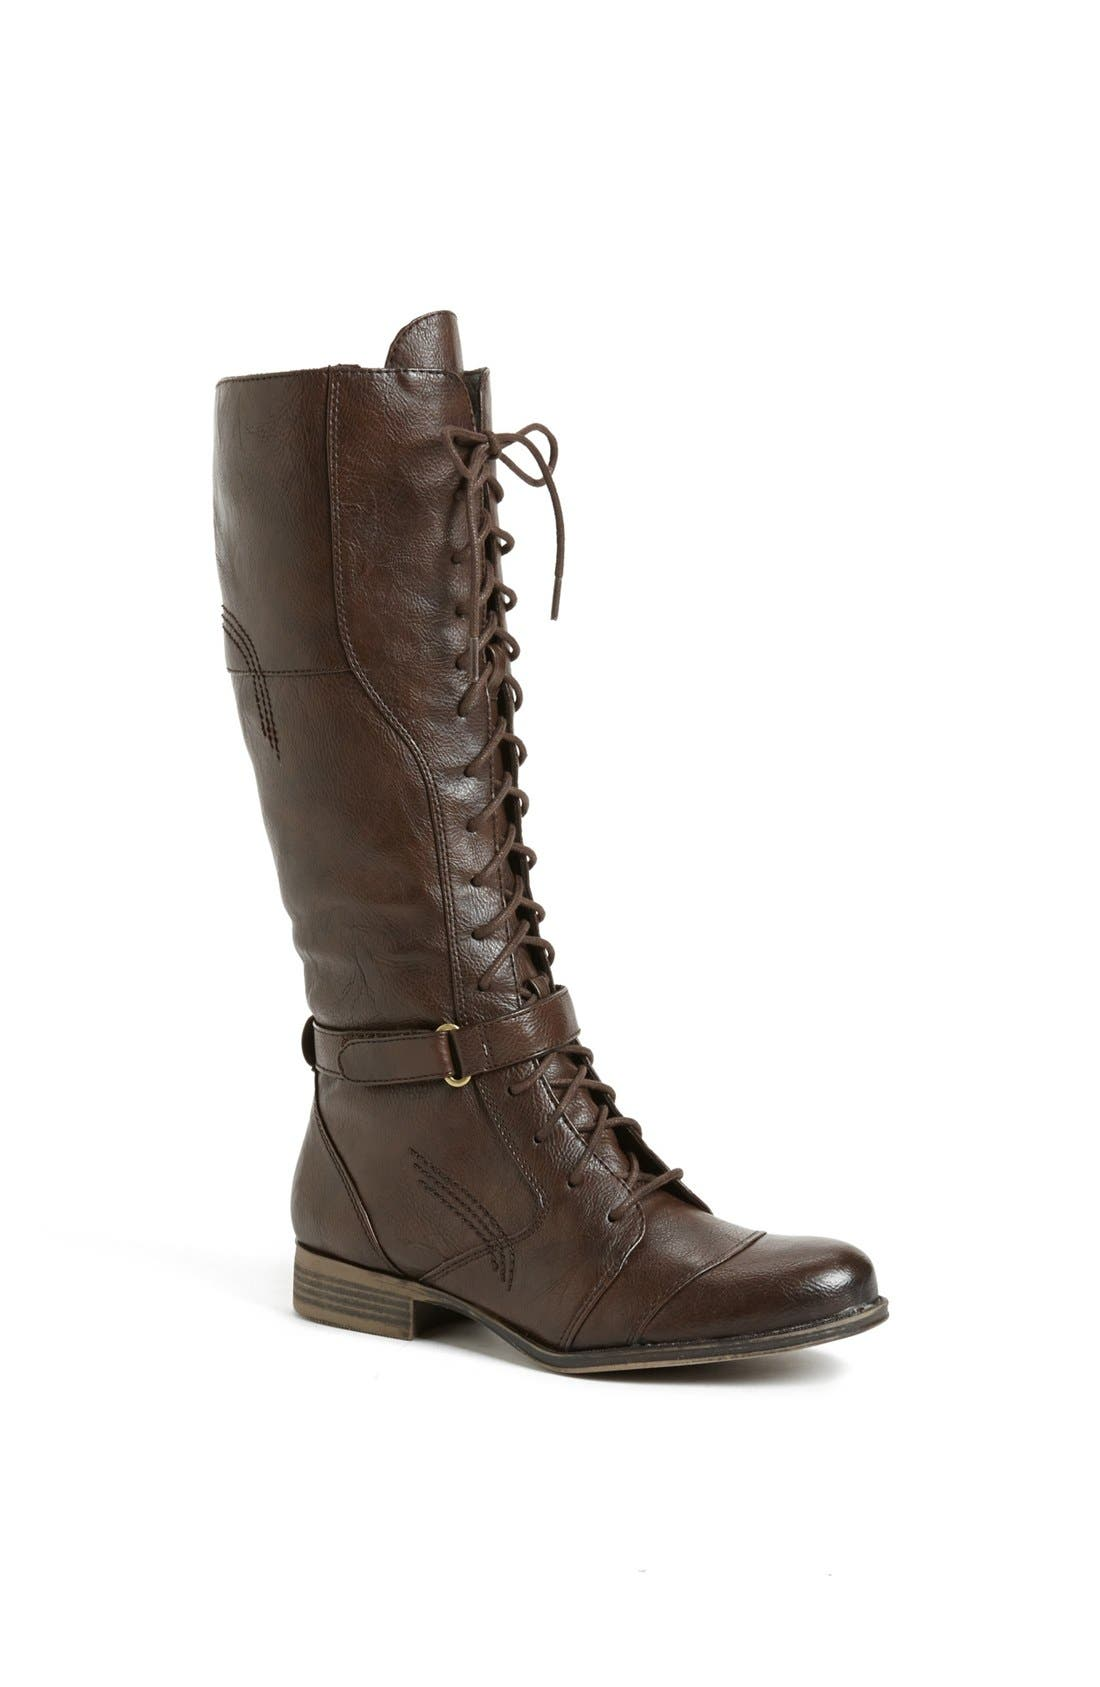 Alternate Image 1 Selected - Naturalizer 'Jakes' Boot